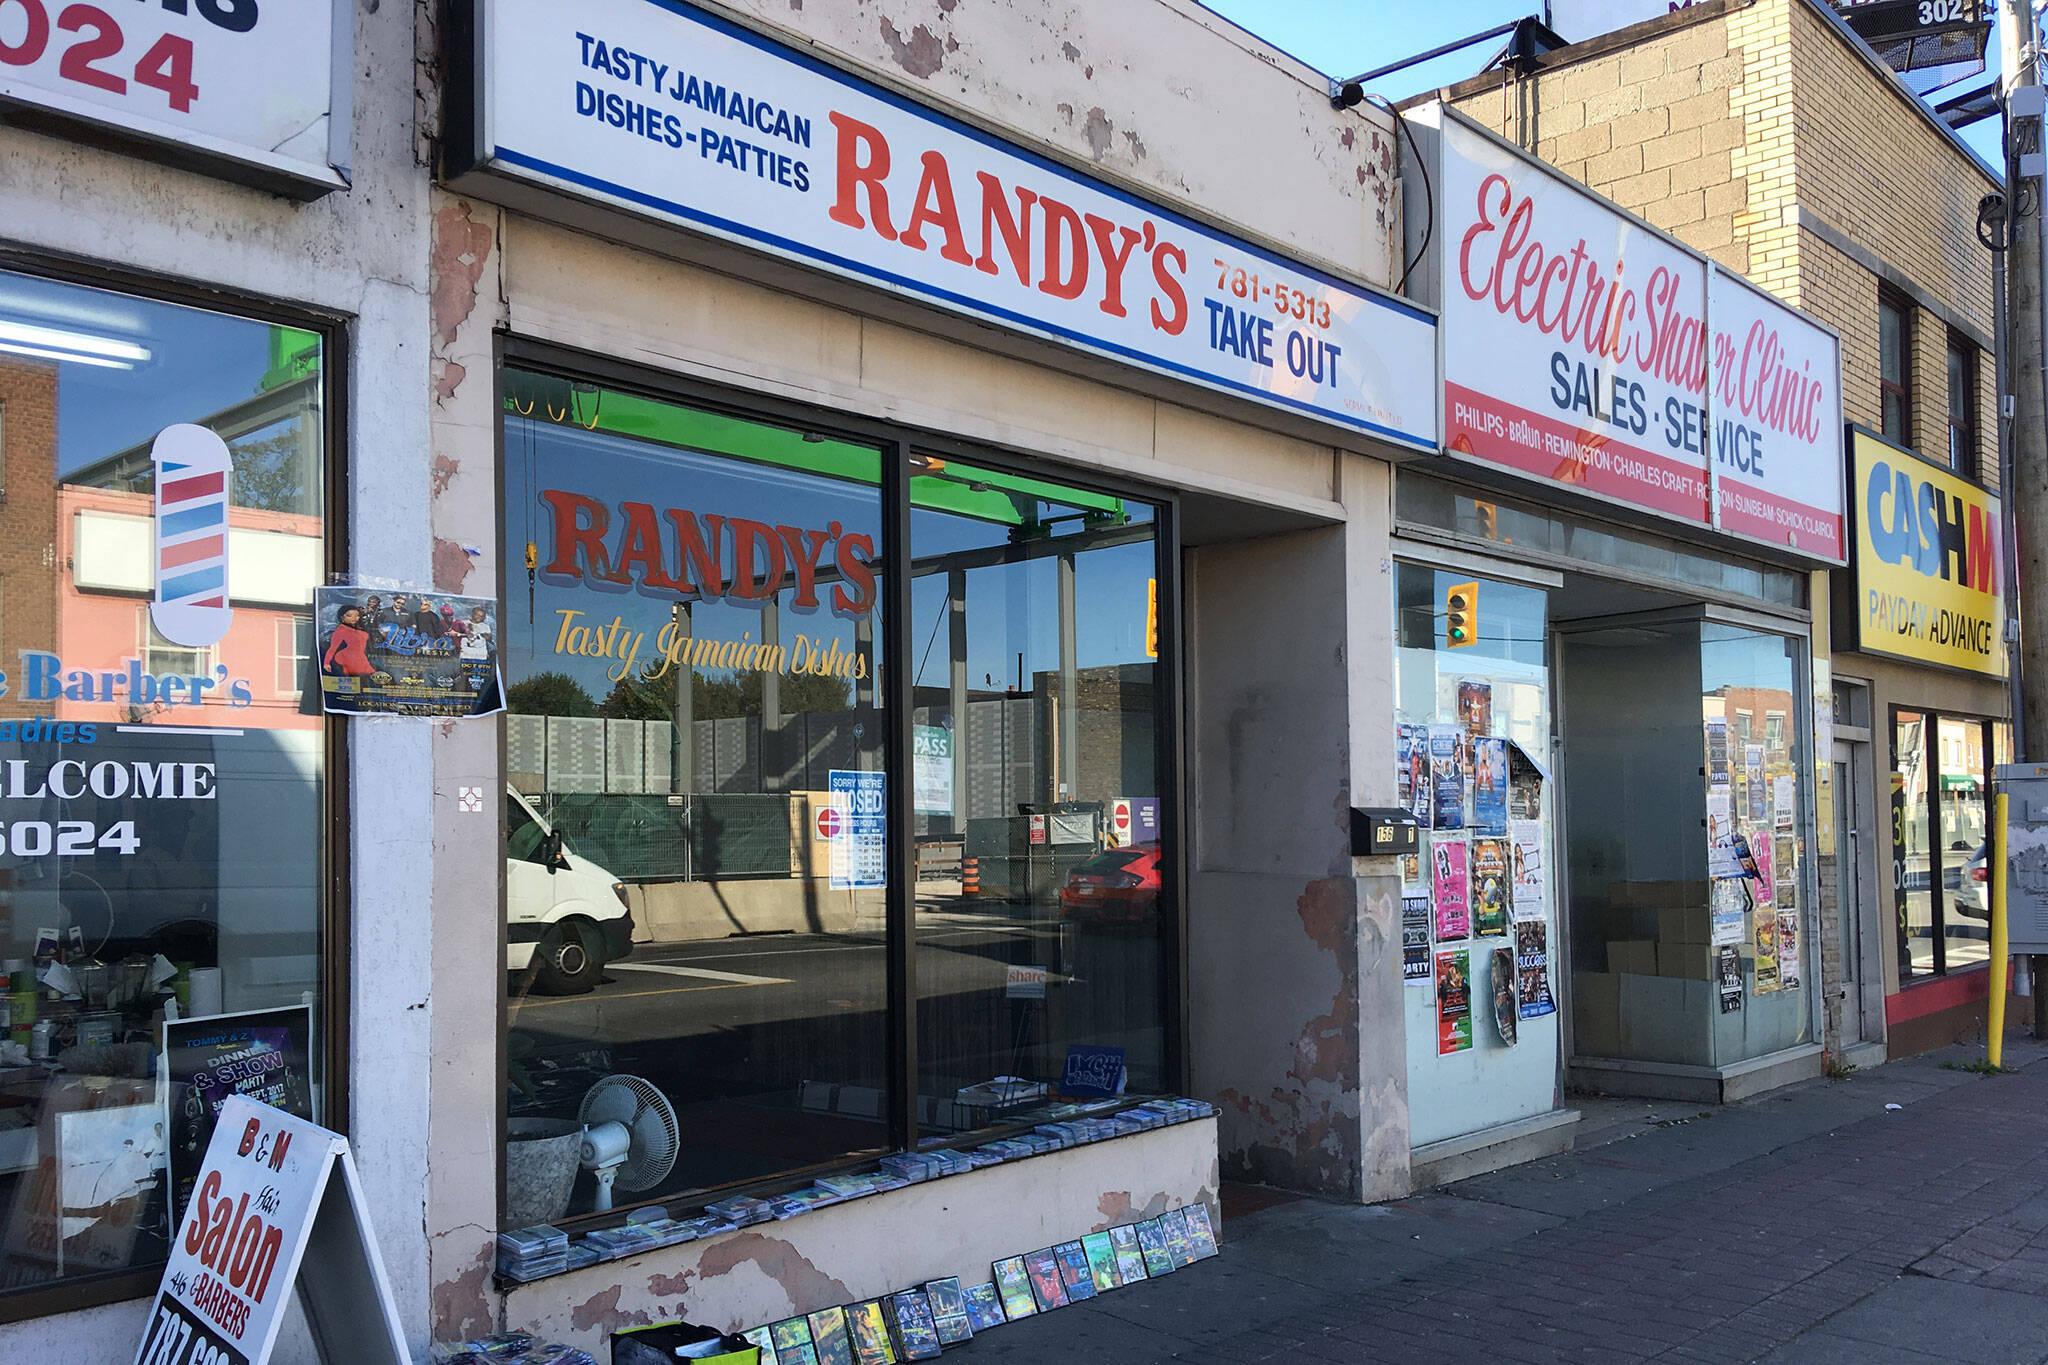 Randy's Patties